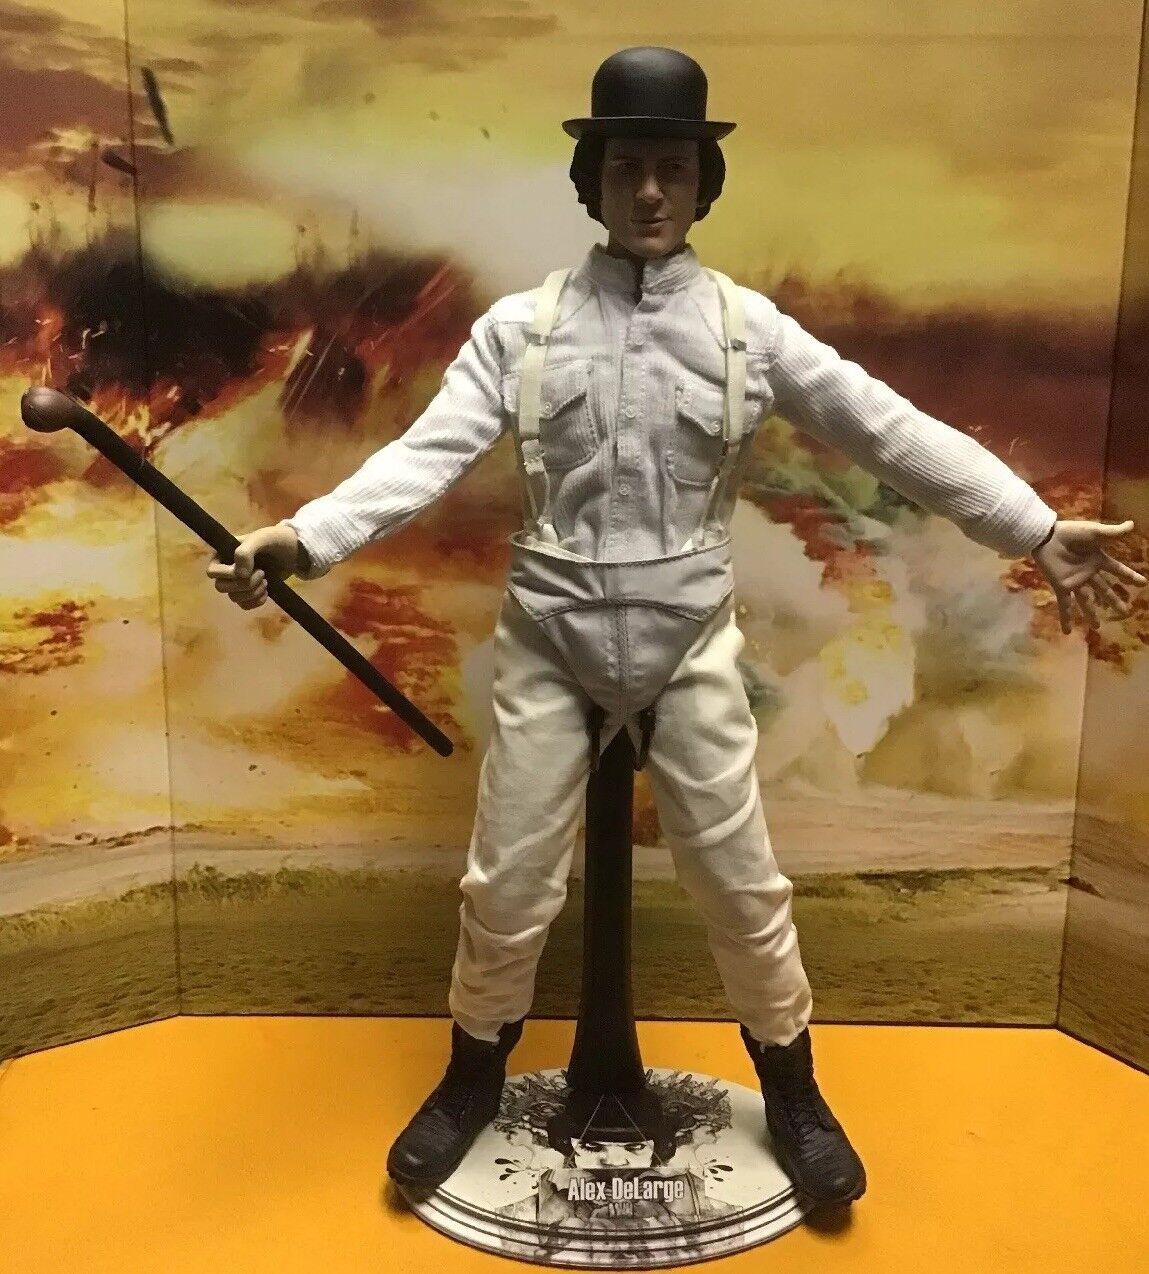 Clockwork orange, Alex DeLarge, Malcolm McDowell 1 6 Scale verkan Figur